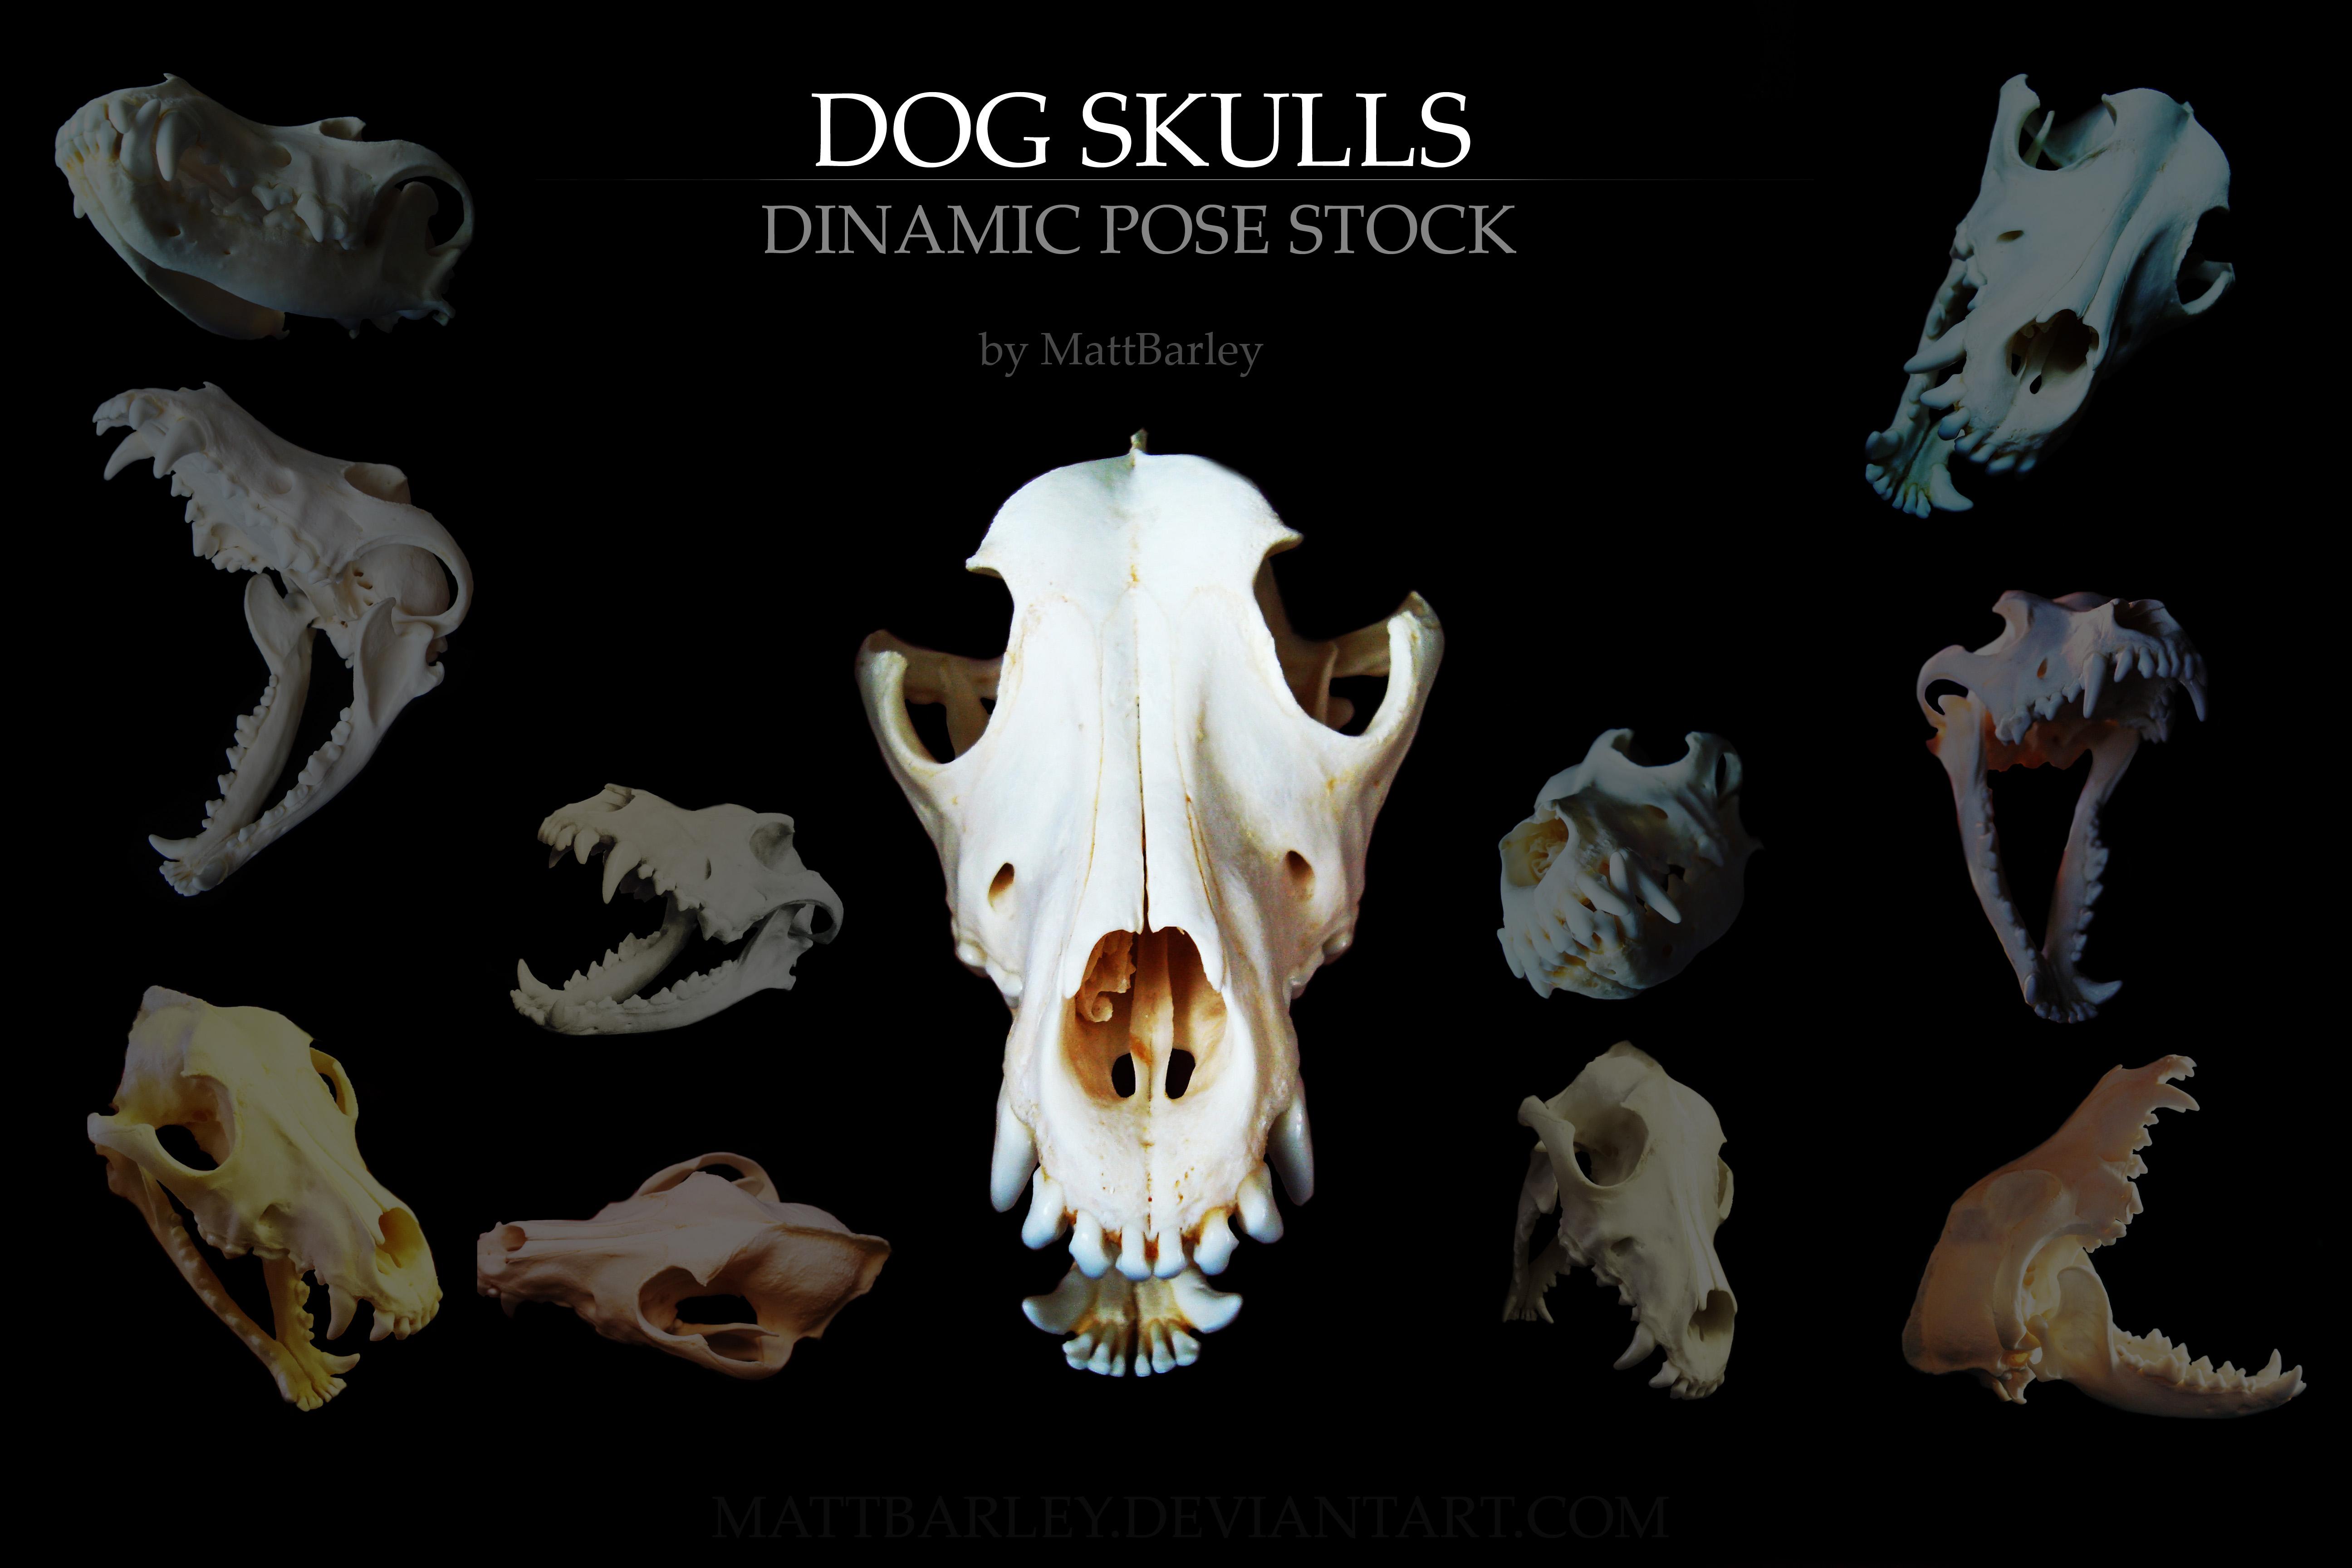 Dog skulls stock by MattBarley